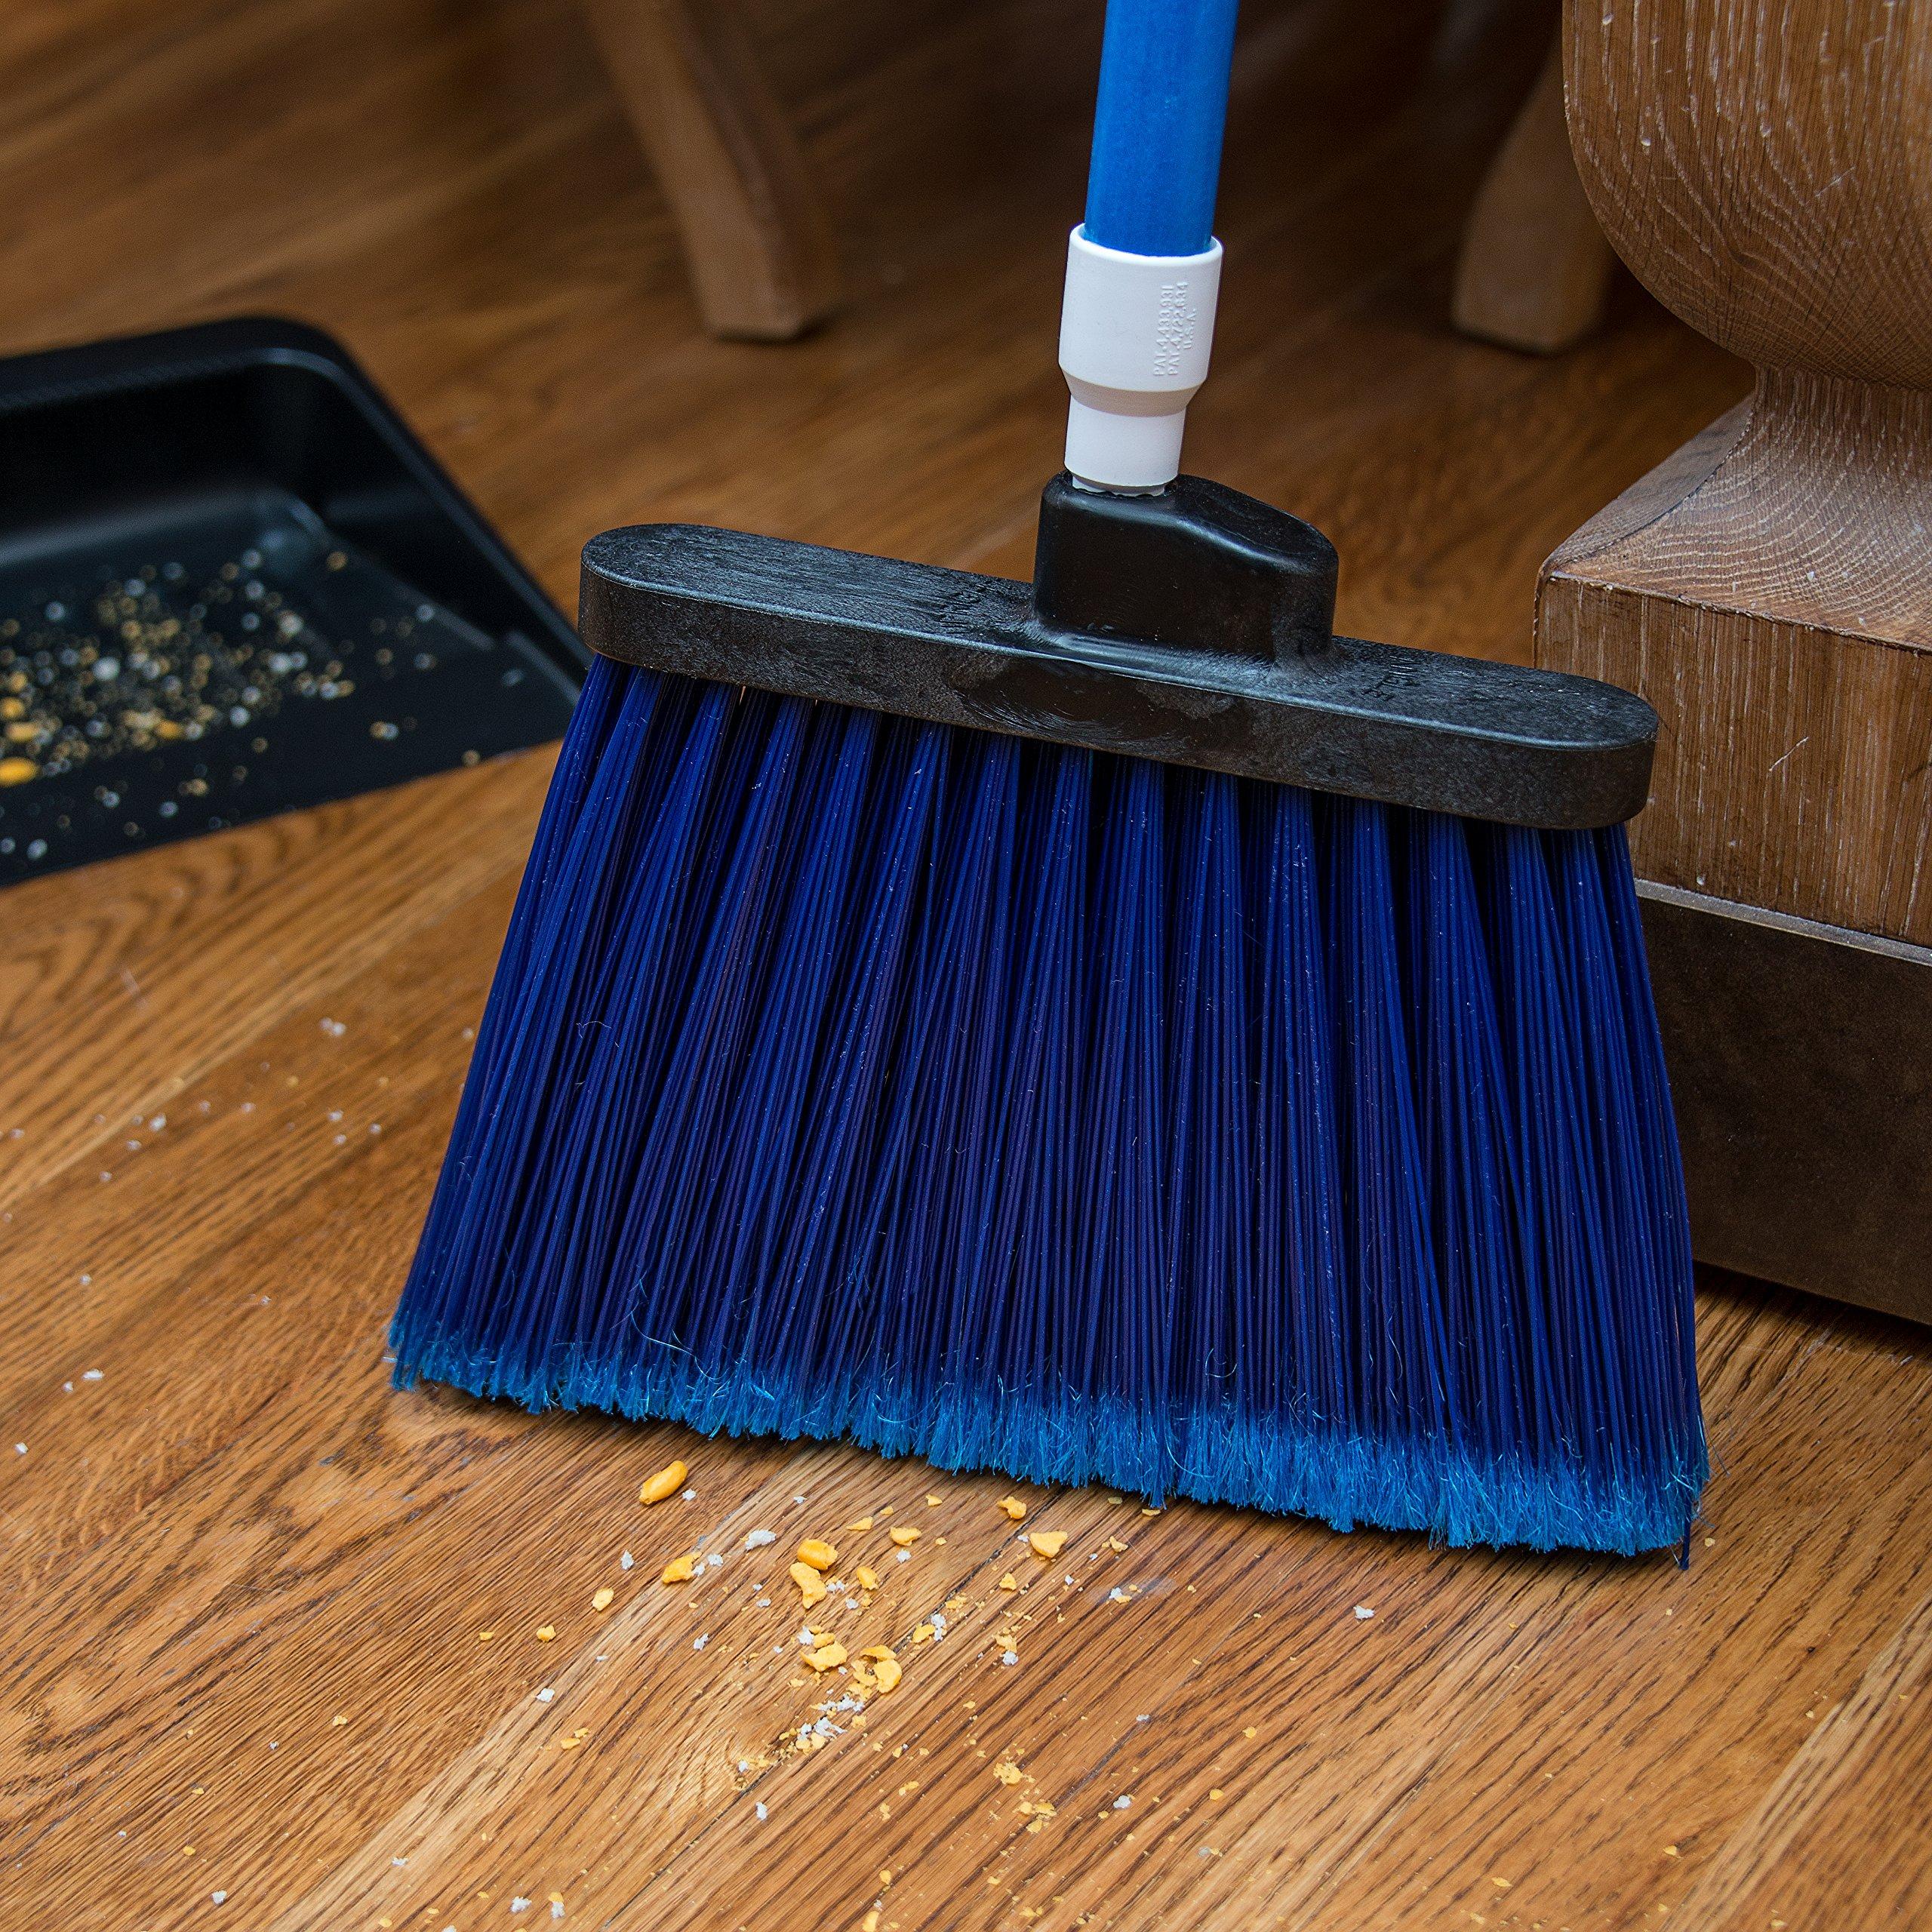 Carlisle 3686714 Duo-Sweep Medium Duty Flagged Angle Broom Head, Polypropylene Bristle, 8'' Overall Length x 12'' Width, Blue (Pack of 12) by Carlisle (Image #6)